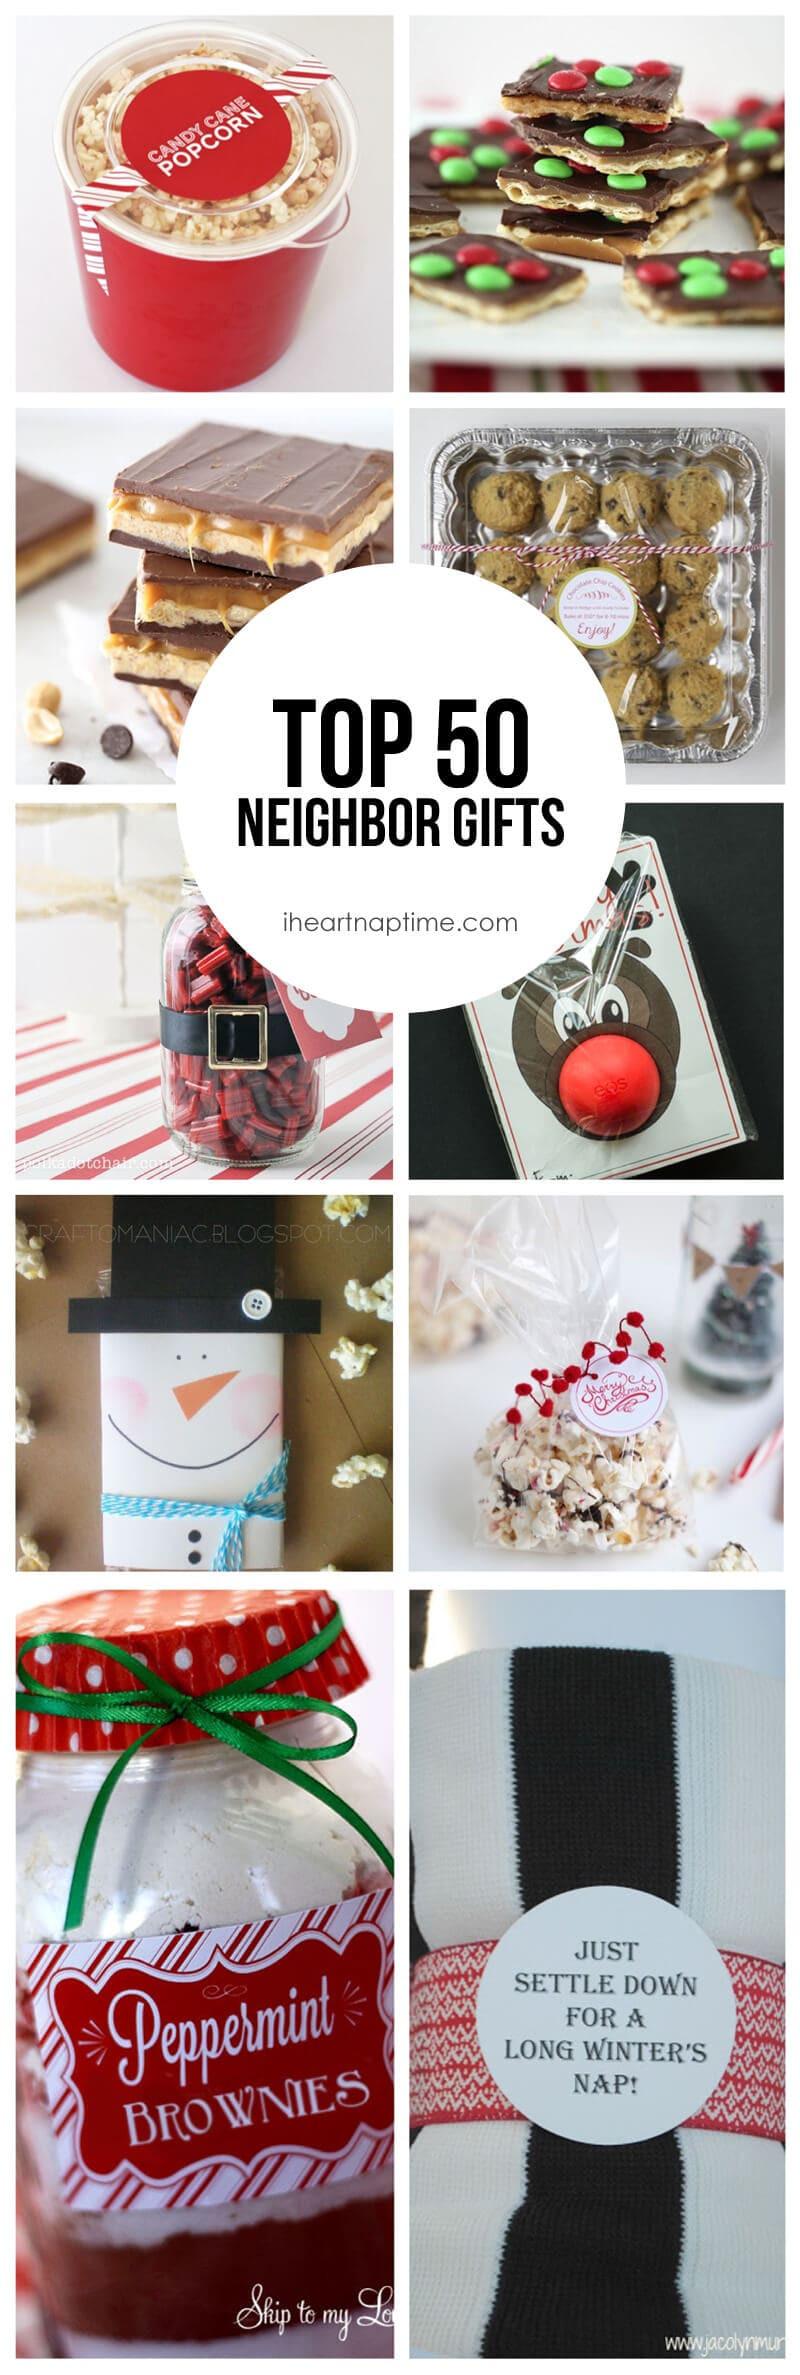 Neighbors Gift Ideas For Christmas  Top 50 Neighbor Gift Ideas I Heart Nap Time